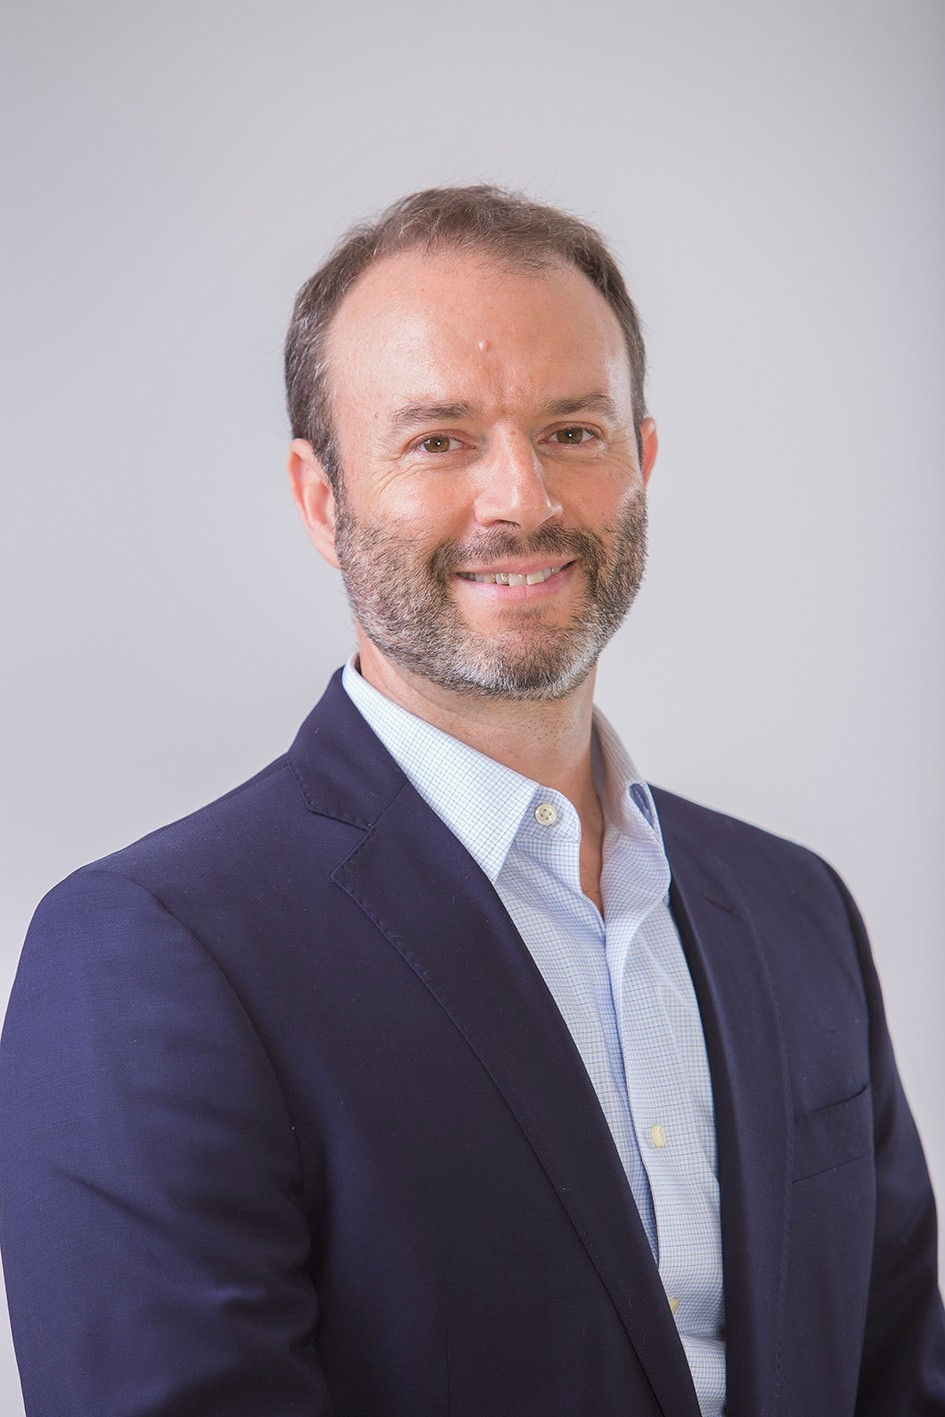 Pablo Popik fue elegido presidente del Instituto Petroquímico Argentino